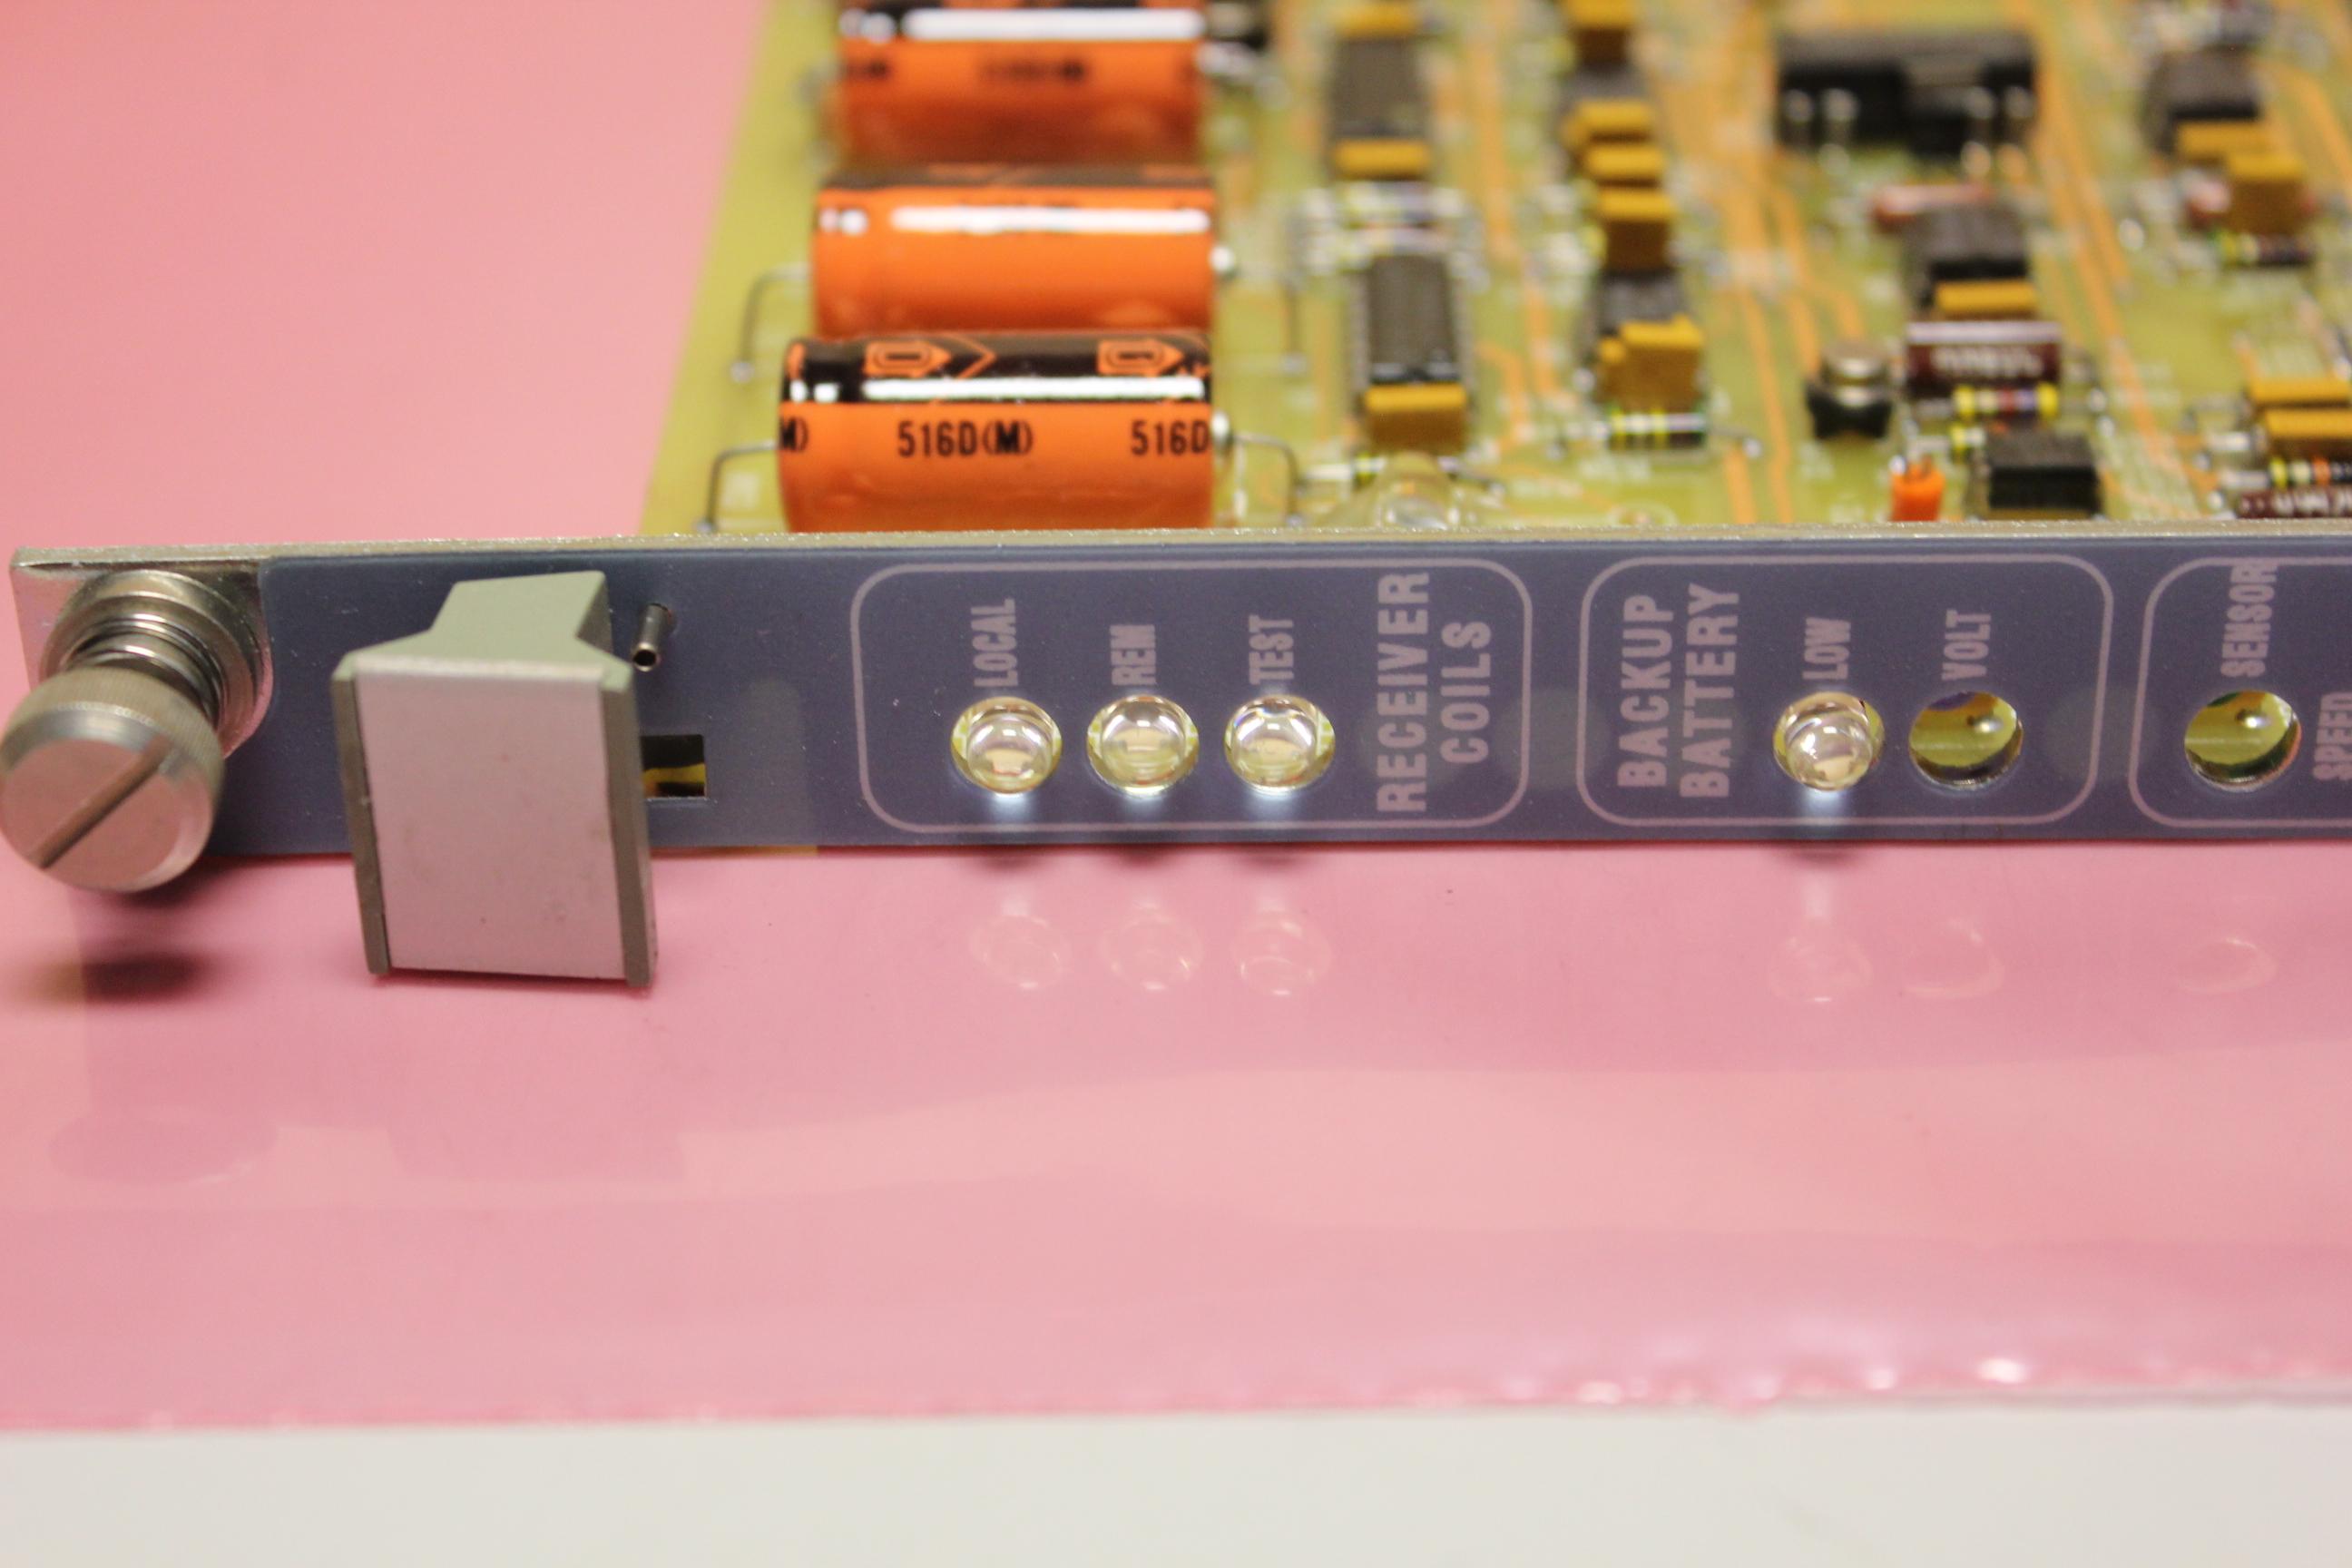 USSI/ANSALDO MULTI-FUNCTION CONTROL MODULE - Image 2 of 4